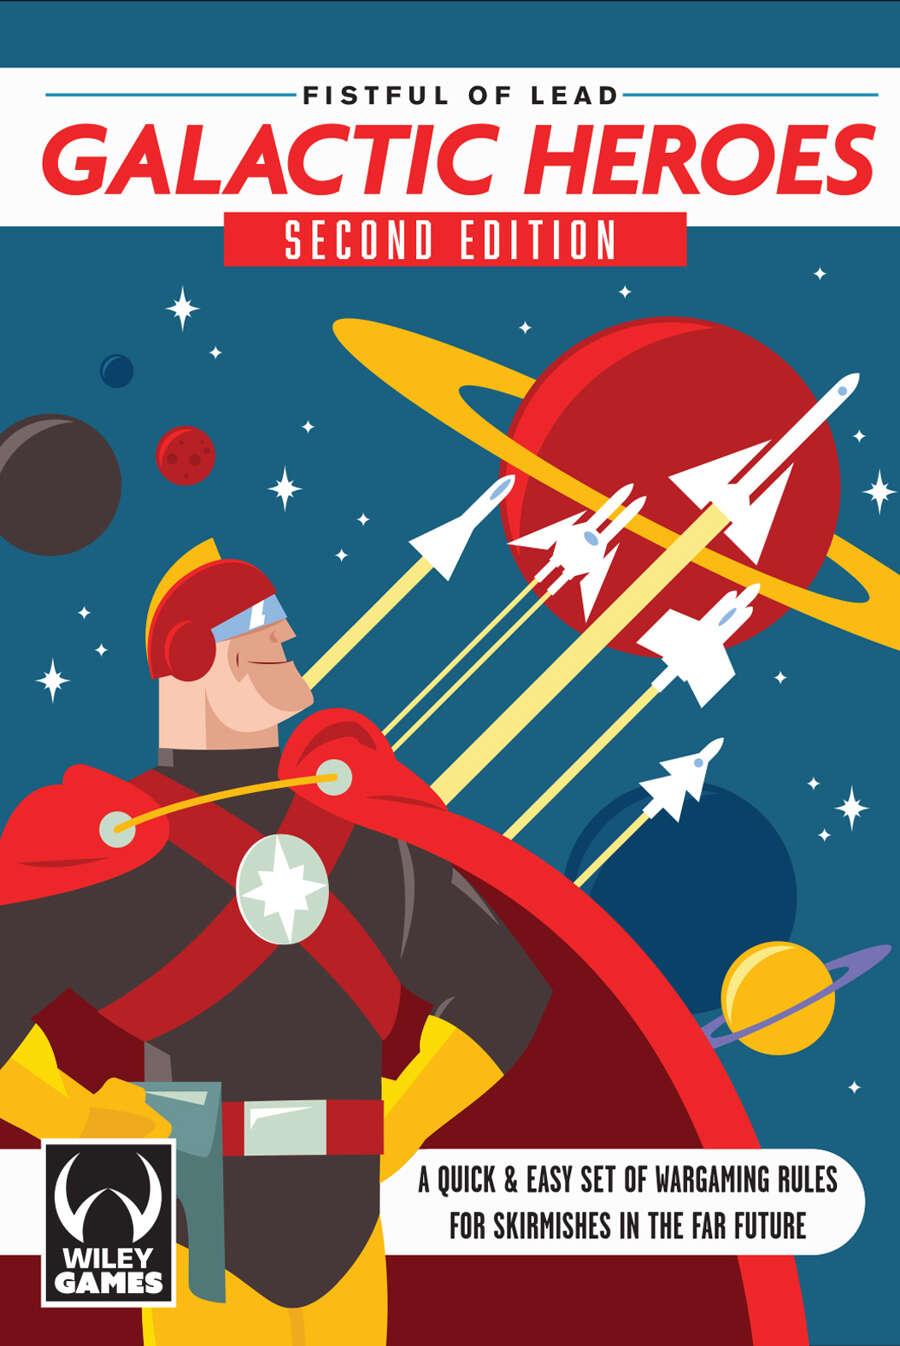 Fistful of Lead: Galactic Heroes